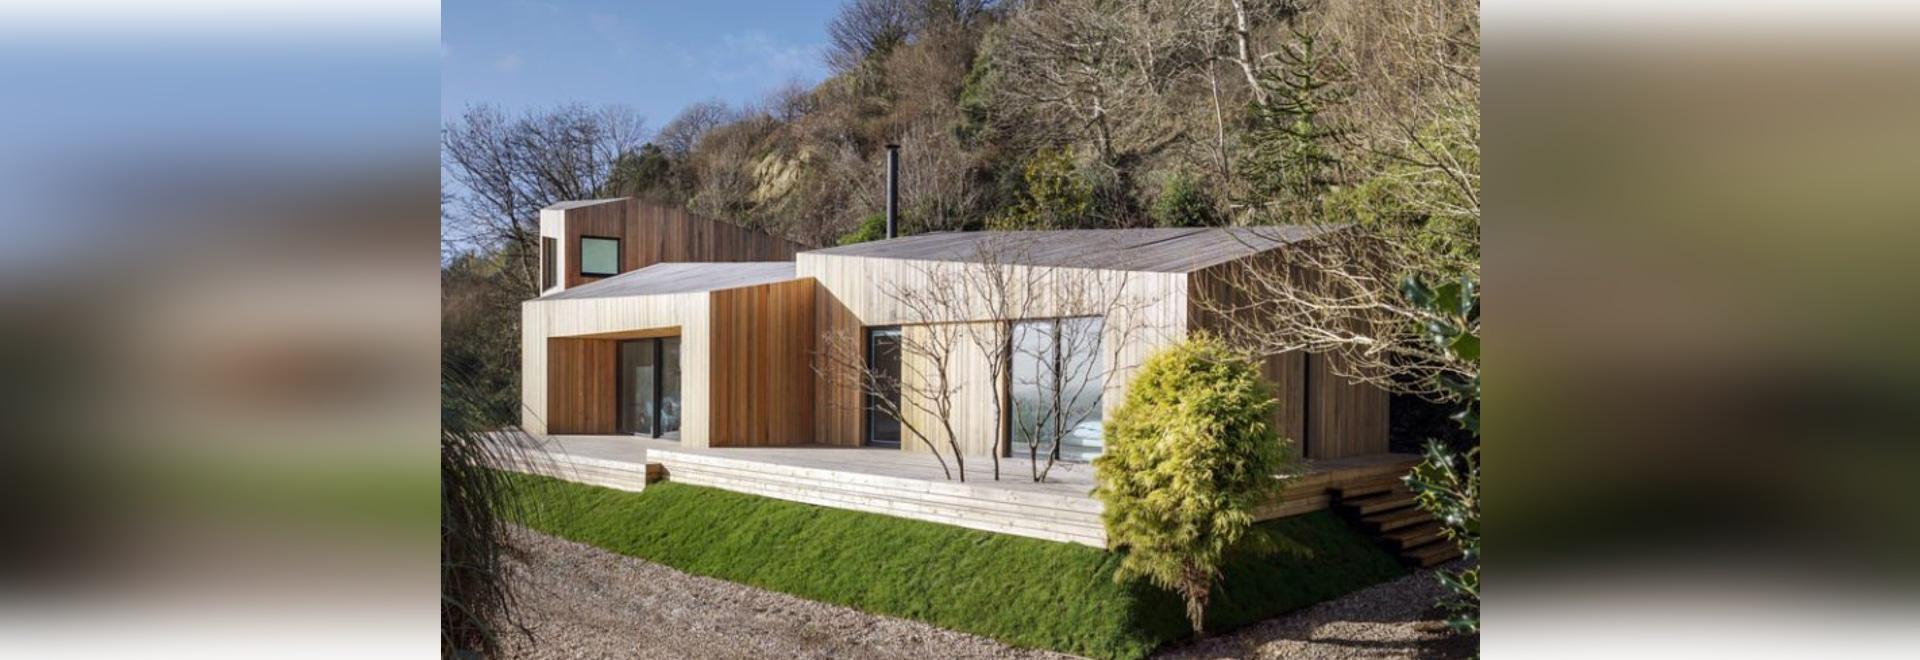 Coperture di raccordo di legno verticali questa casa per le vacanze contemporanea in Inghilterra